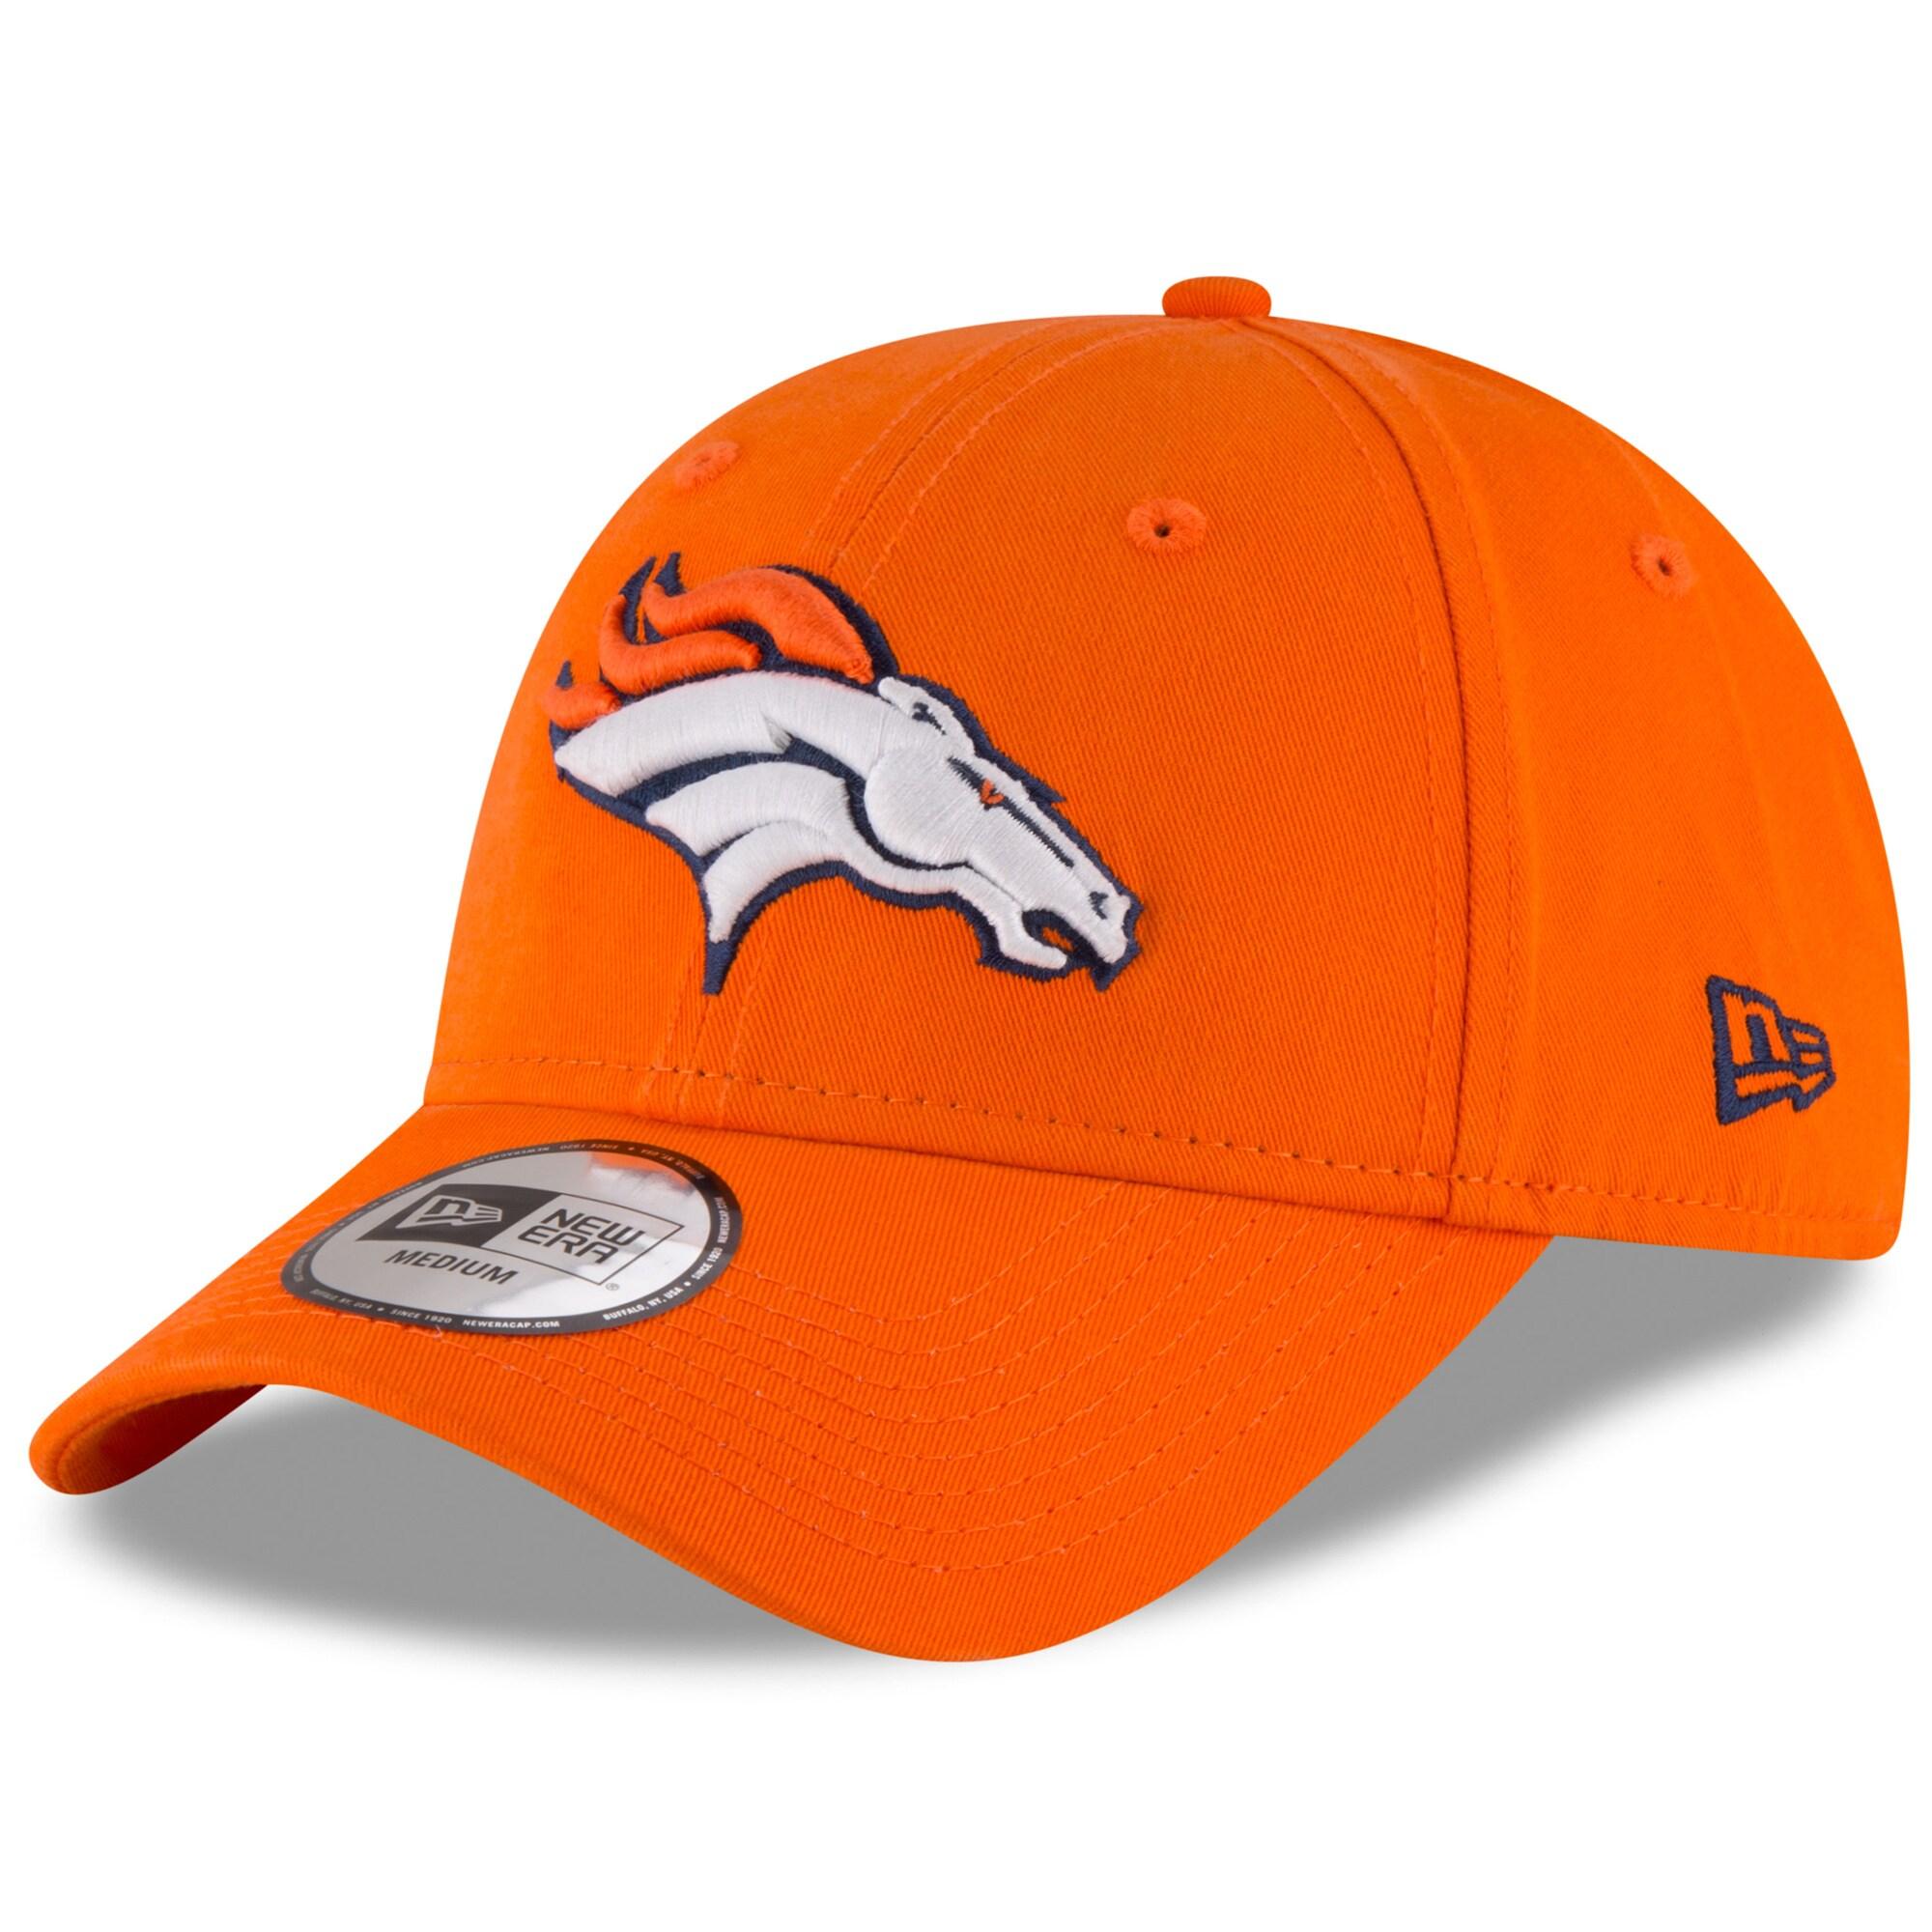 Denver Broncos New Era NE Core Fit 49FORTY Fitted Hat - Orange